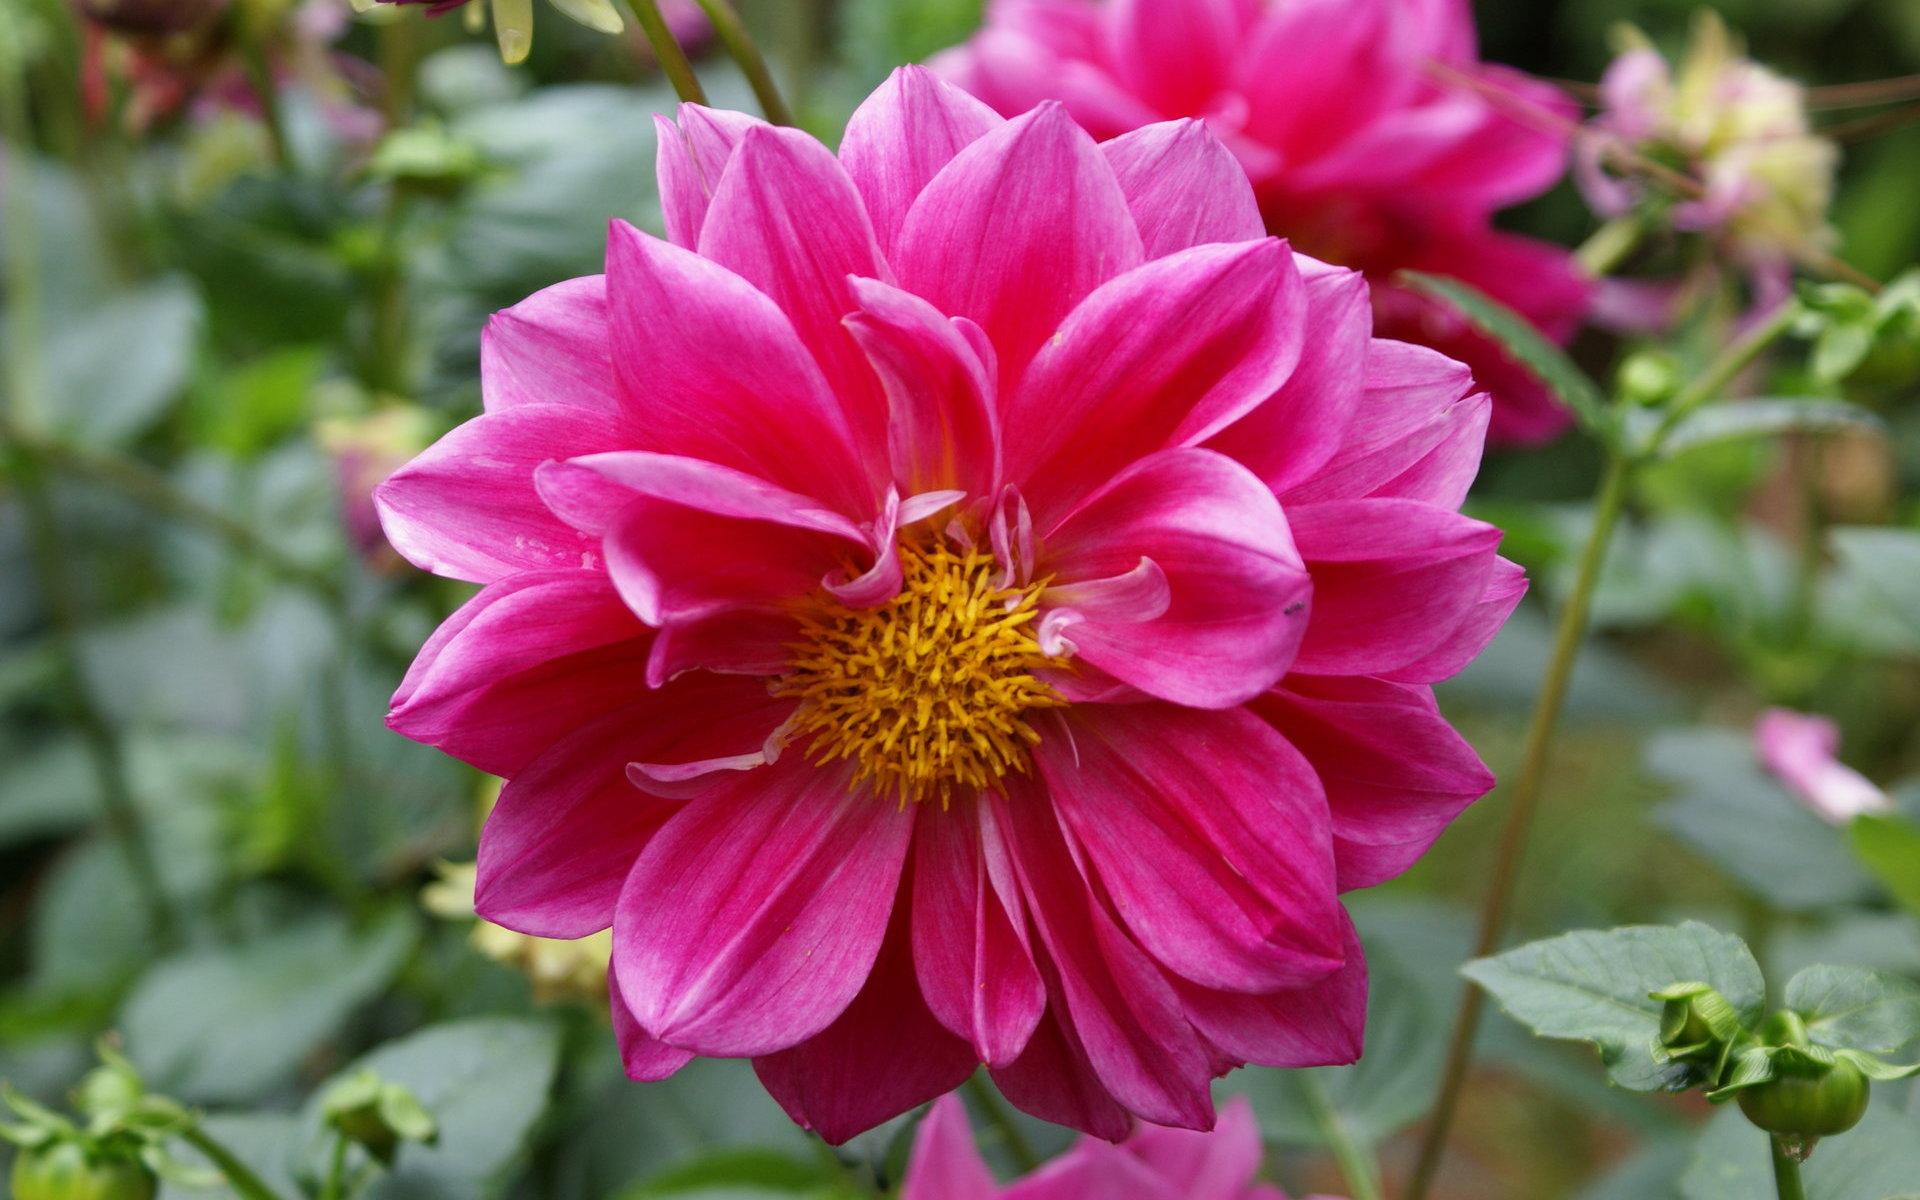 Fondos flores fotos flores mas bellas fondos widescreen - Flores tropicales fotos ...